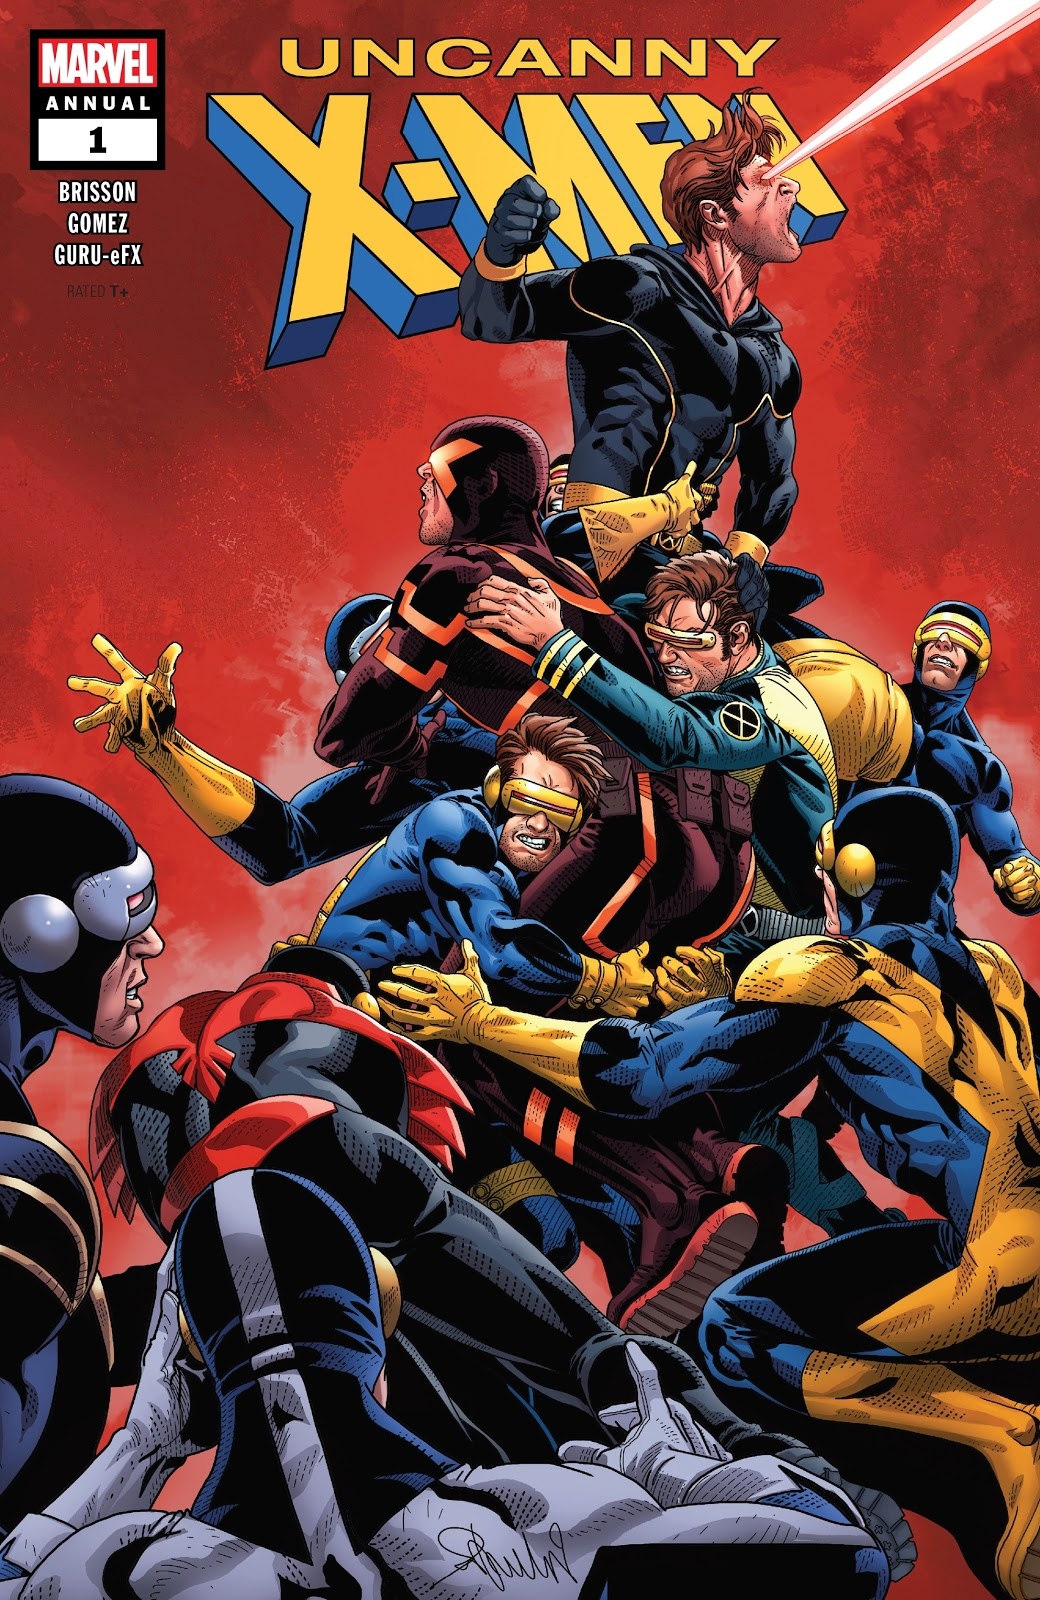 Marvel Xmen